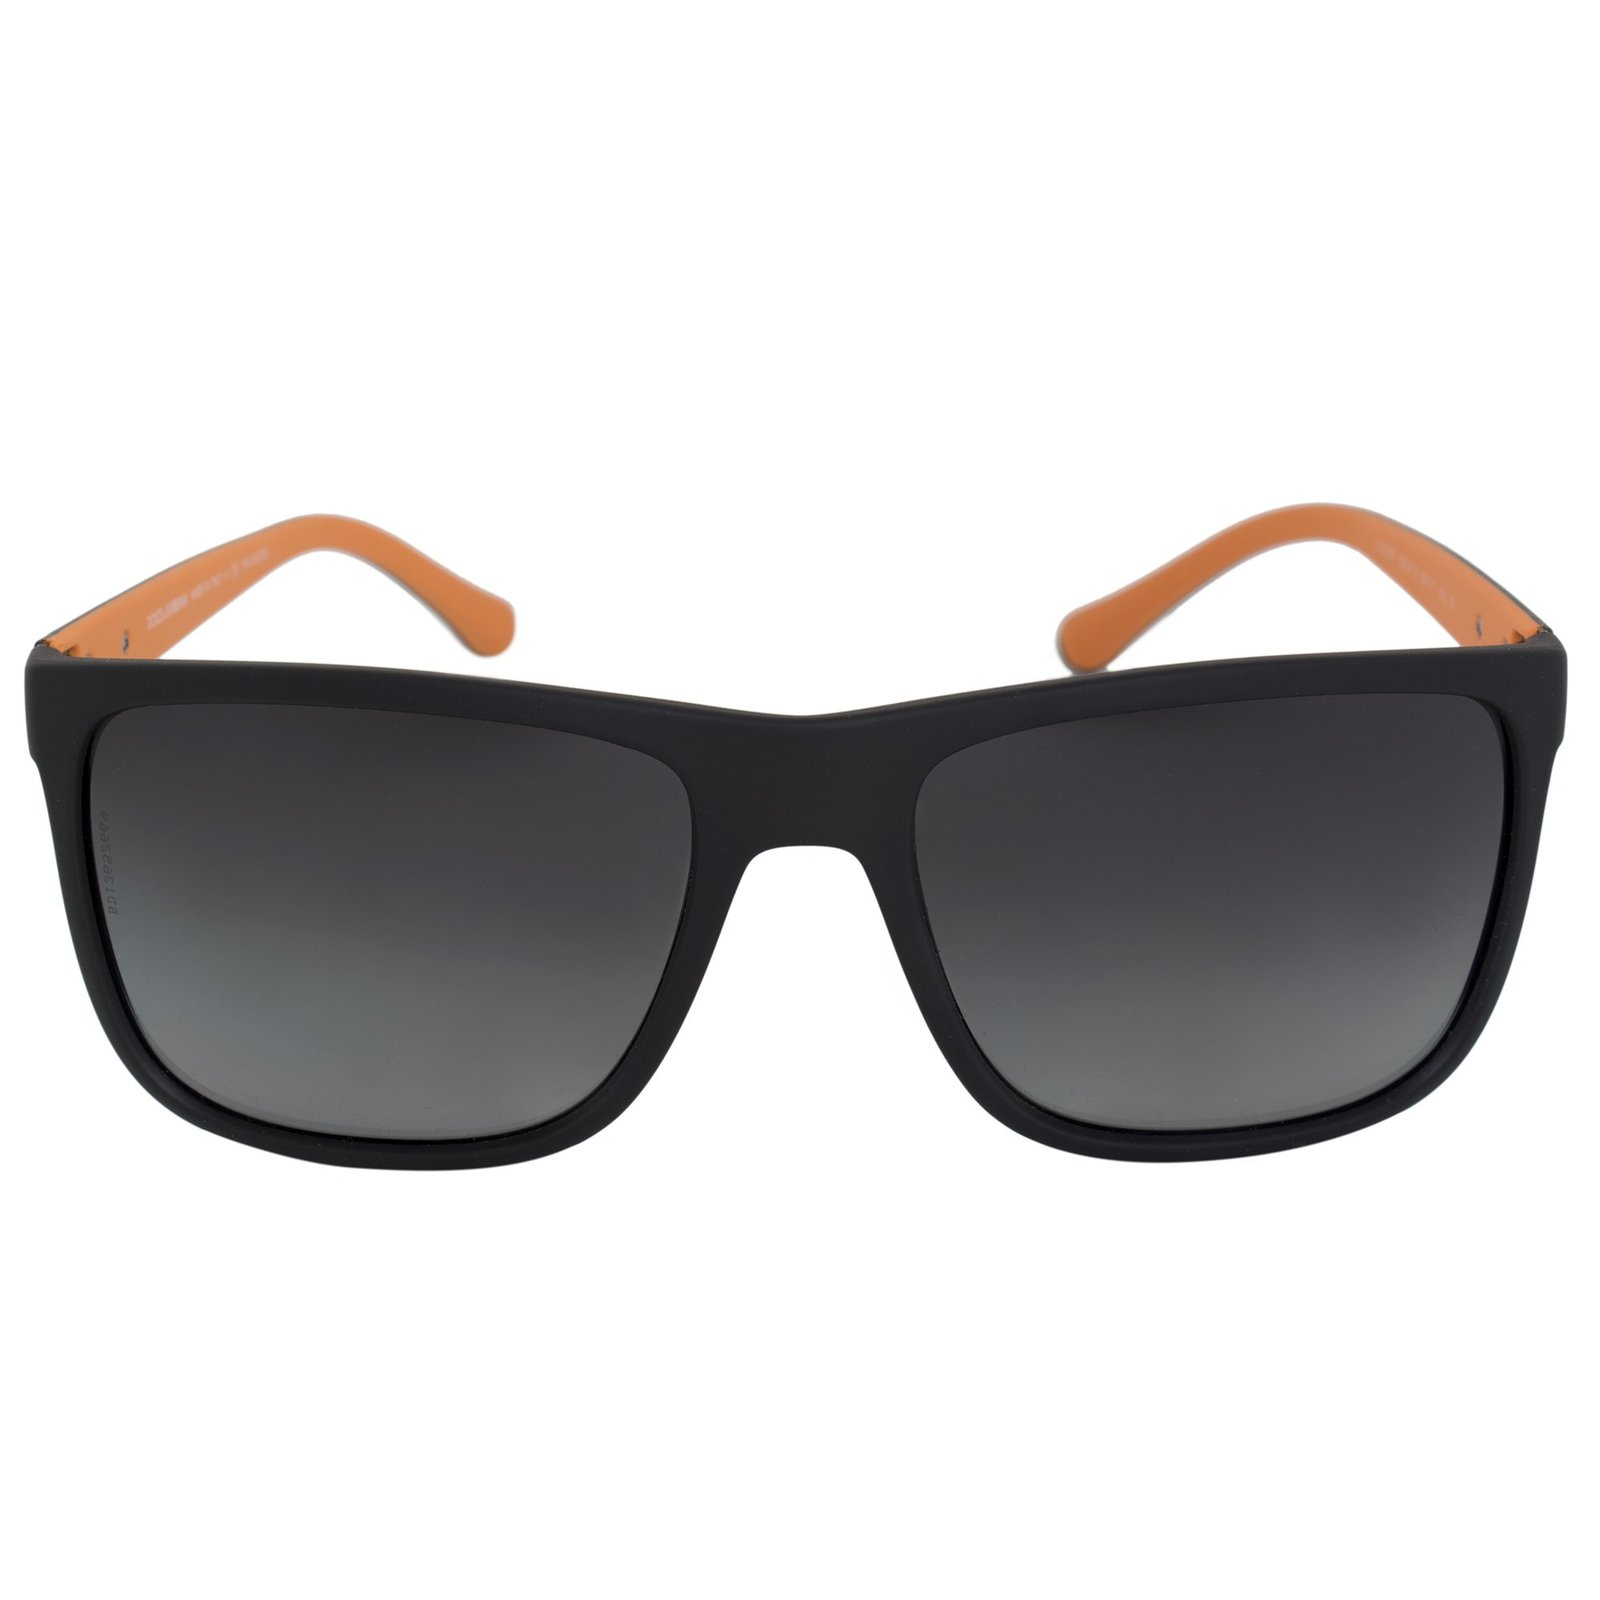 c1ab8c230fb9 Dolce & Gabbana Wayfarer Sunglasses DG6086 and 50 similar items. Dgb sung  dg6086 2809t3 56 pol 1